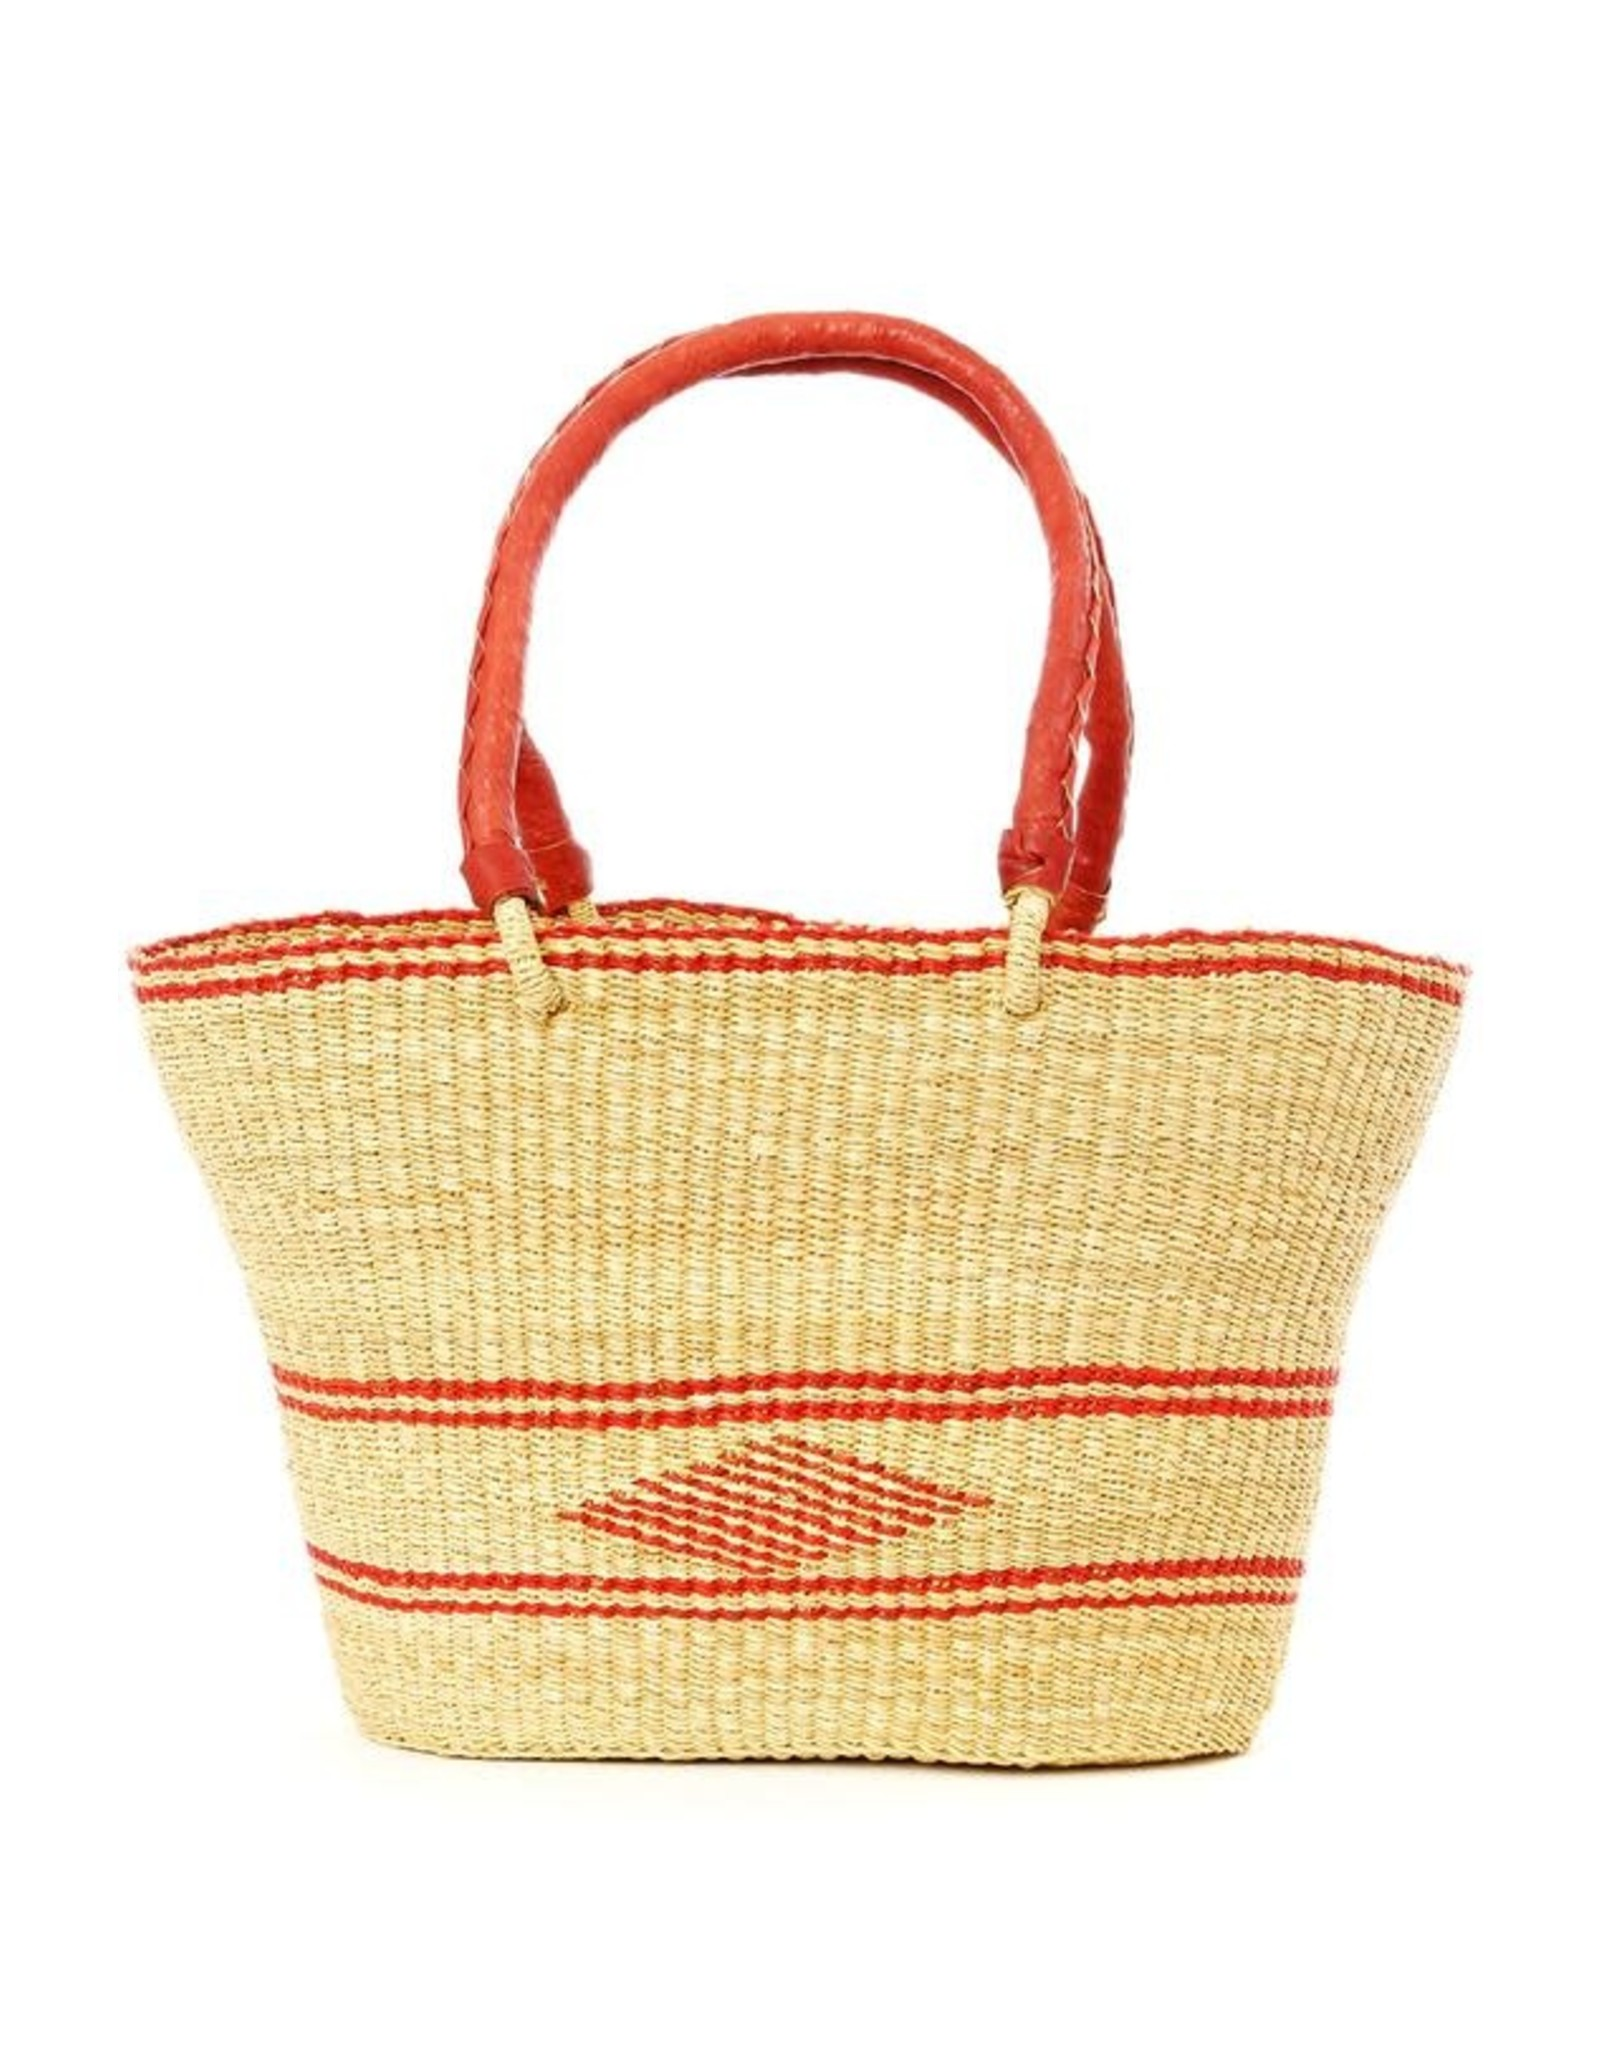 Swahili Wholesale Natural Oval Shopper Bolga Basket, Ghana